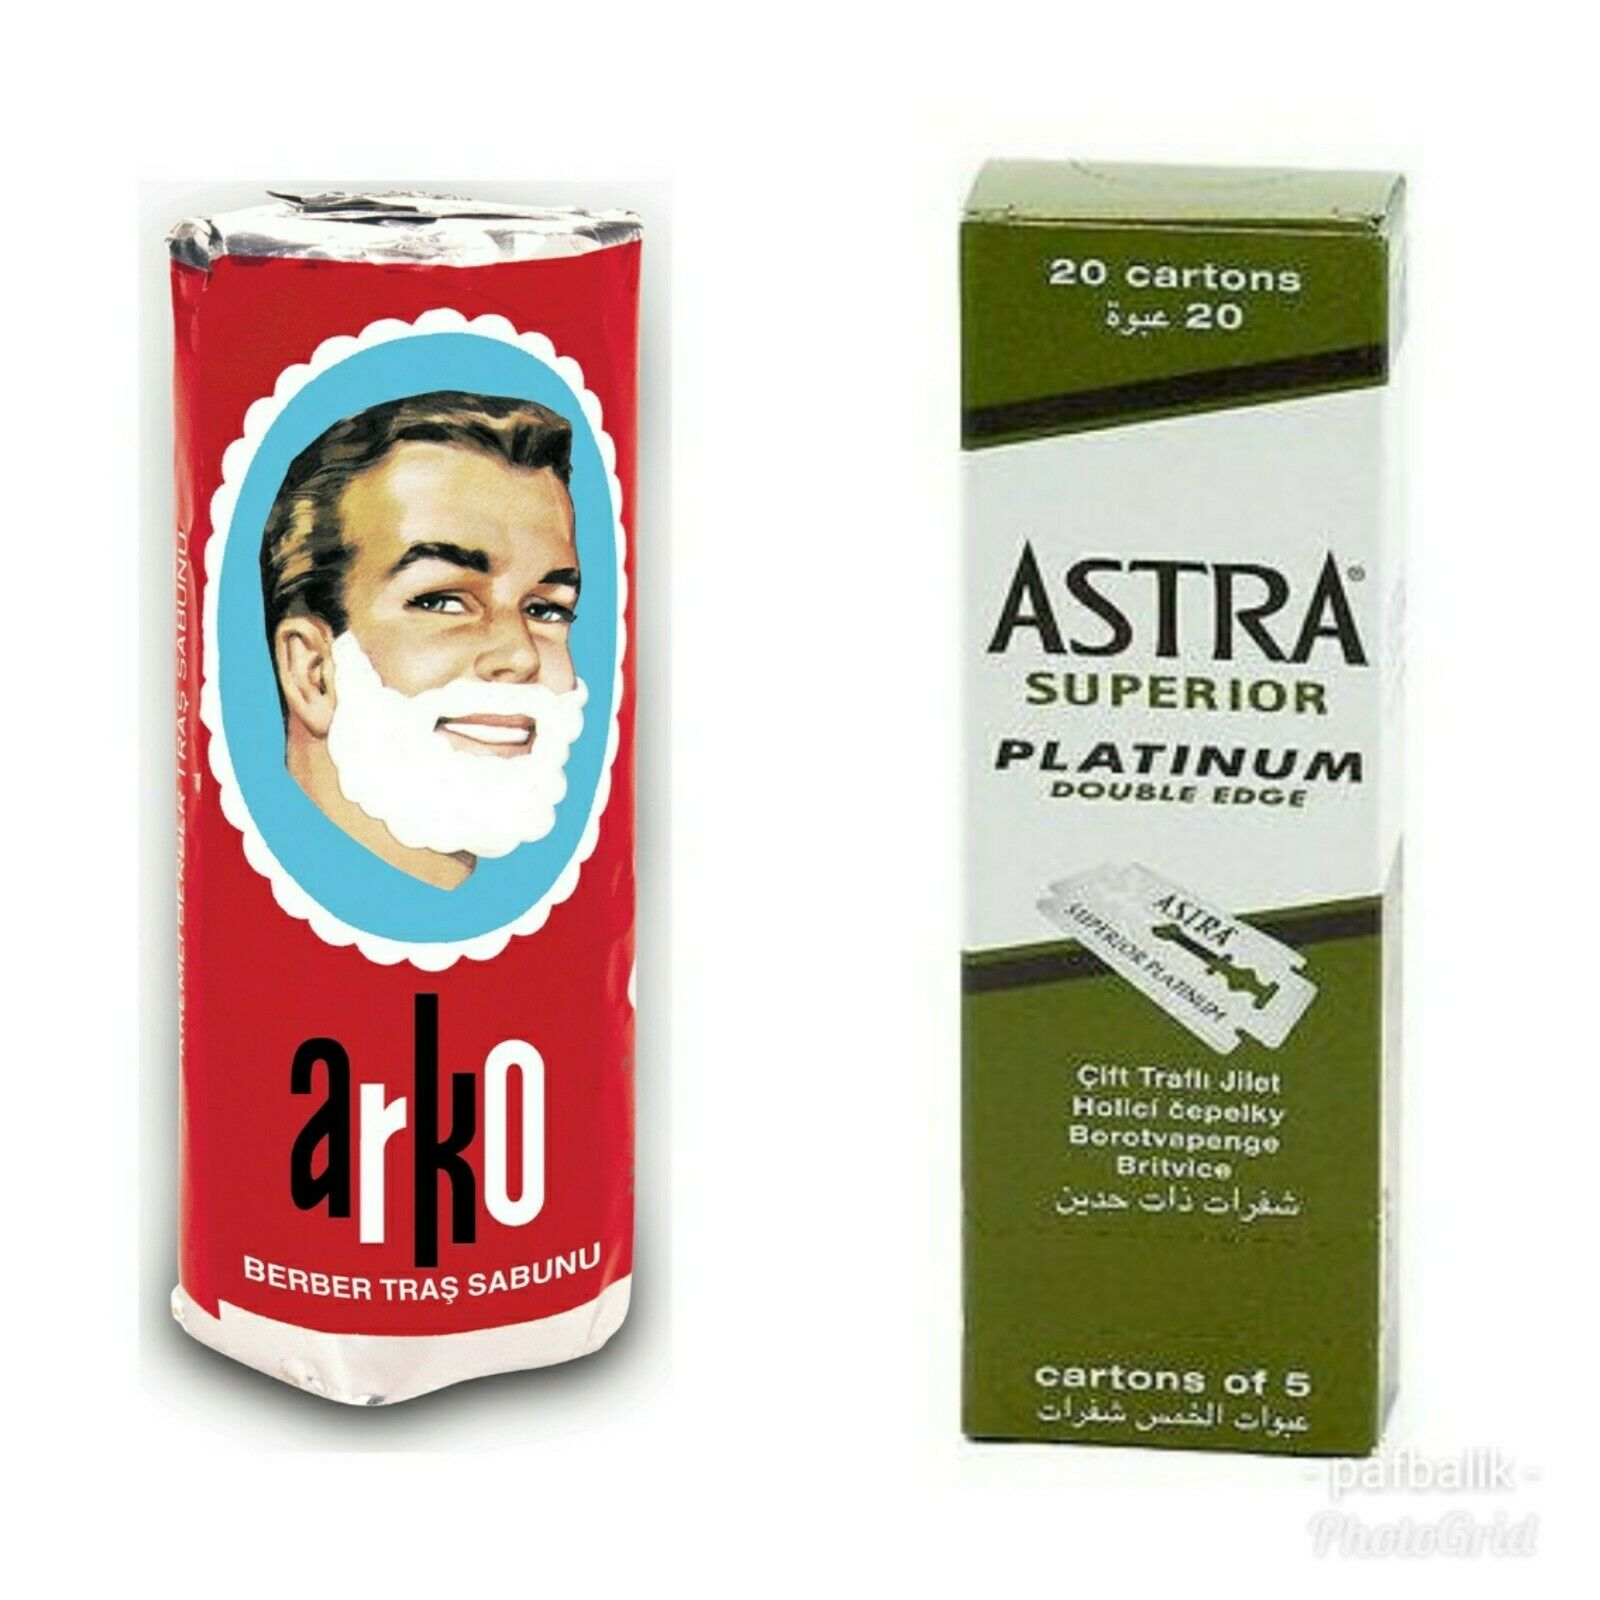 100 Astra Superior Platinum Double Edge Side Safety Shaving Razor Razor Blades + Arko Shaving Soap